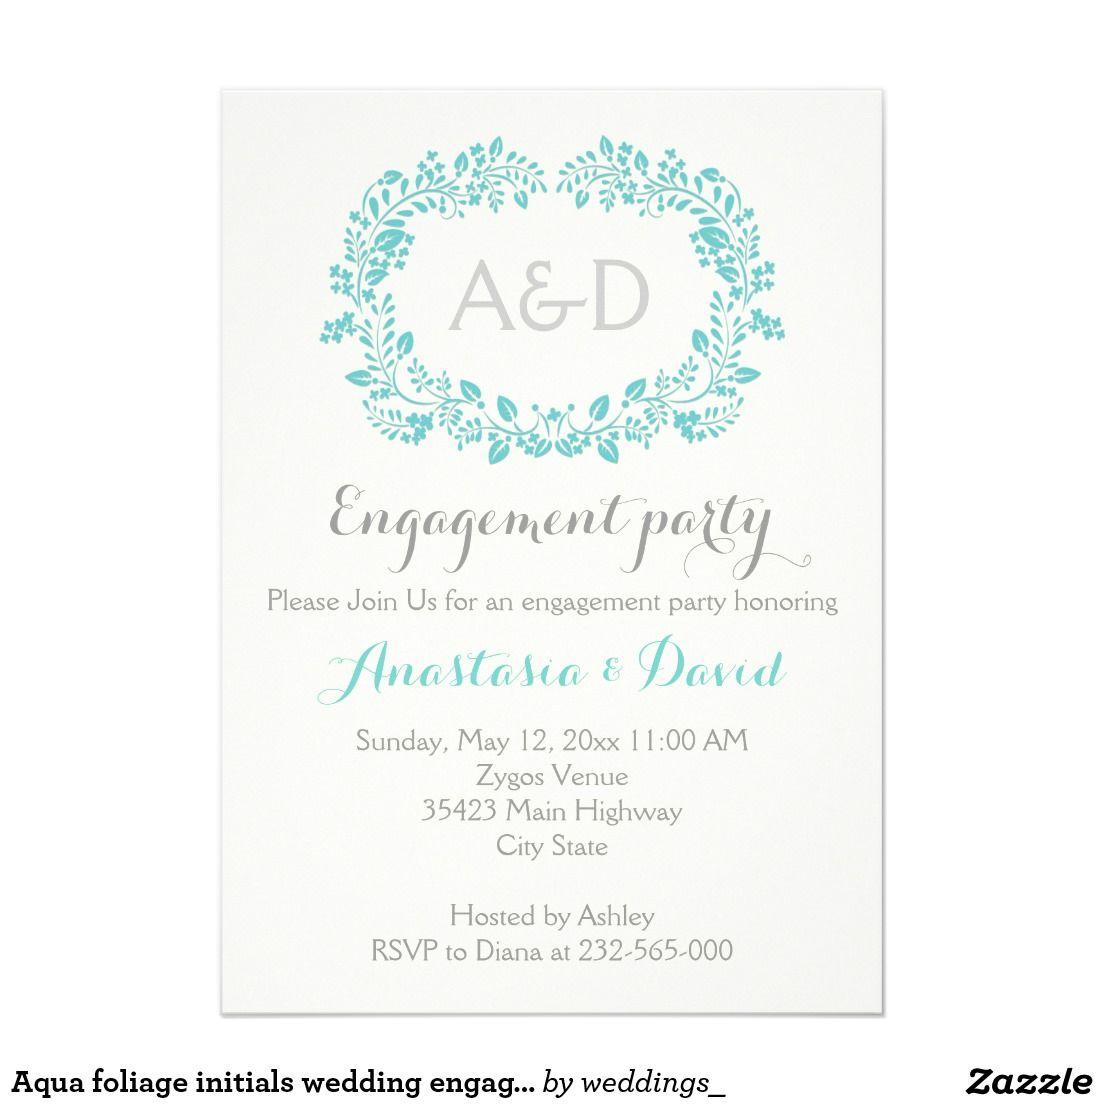 Aqua foliage initials wedding engagement party card | Wedding ...